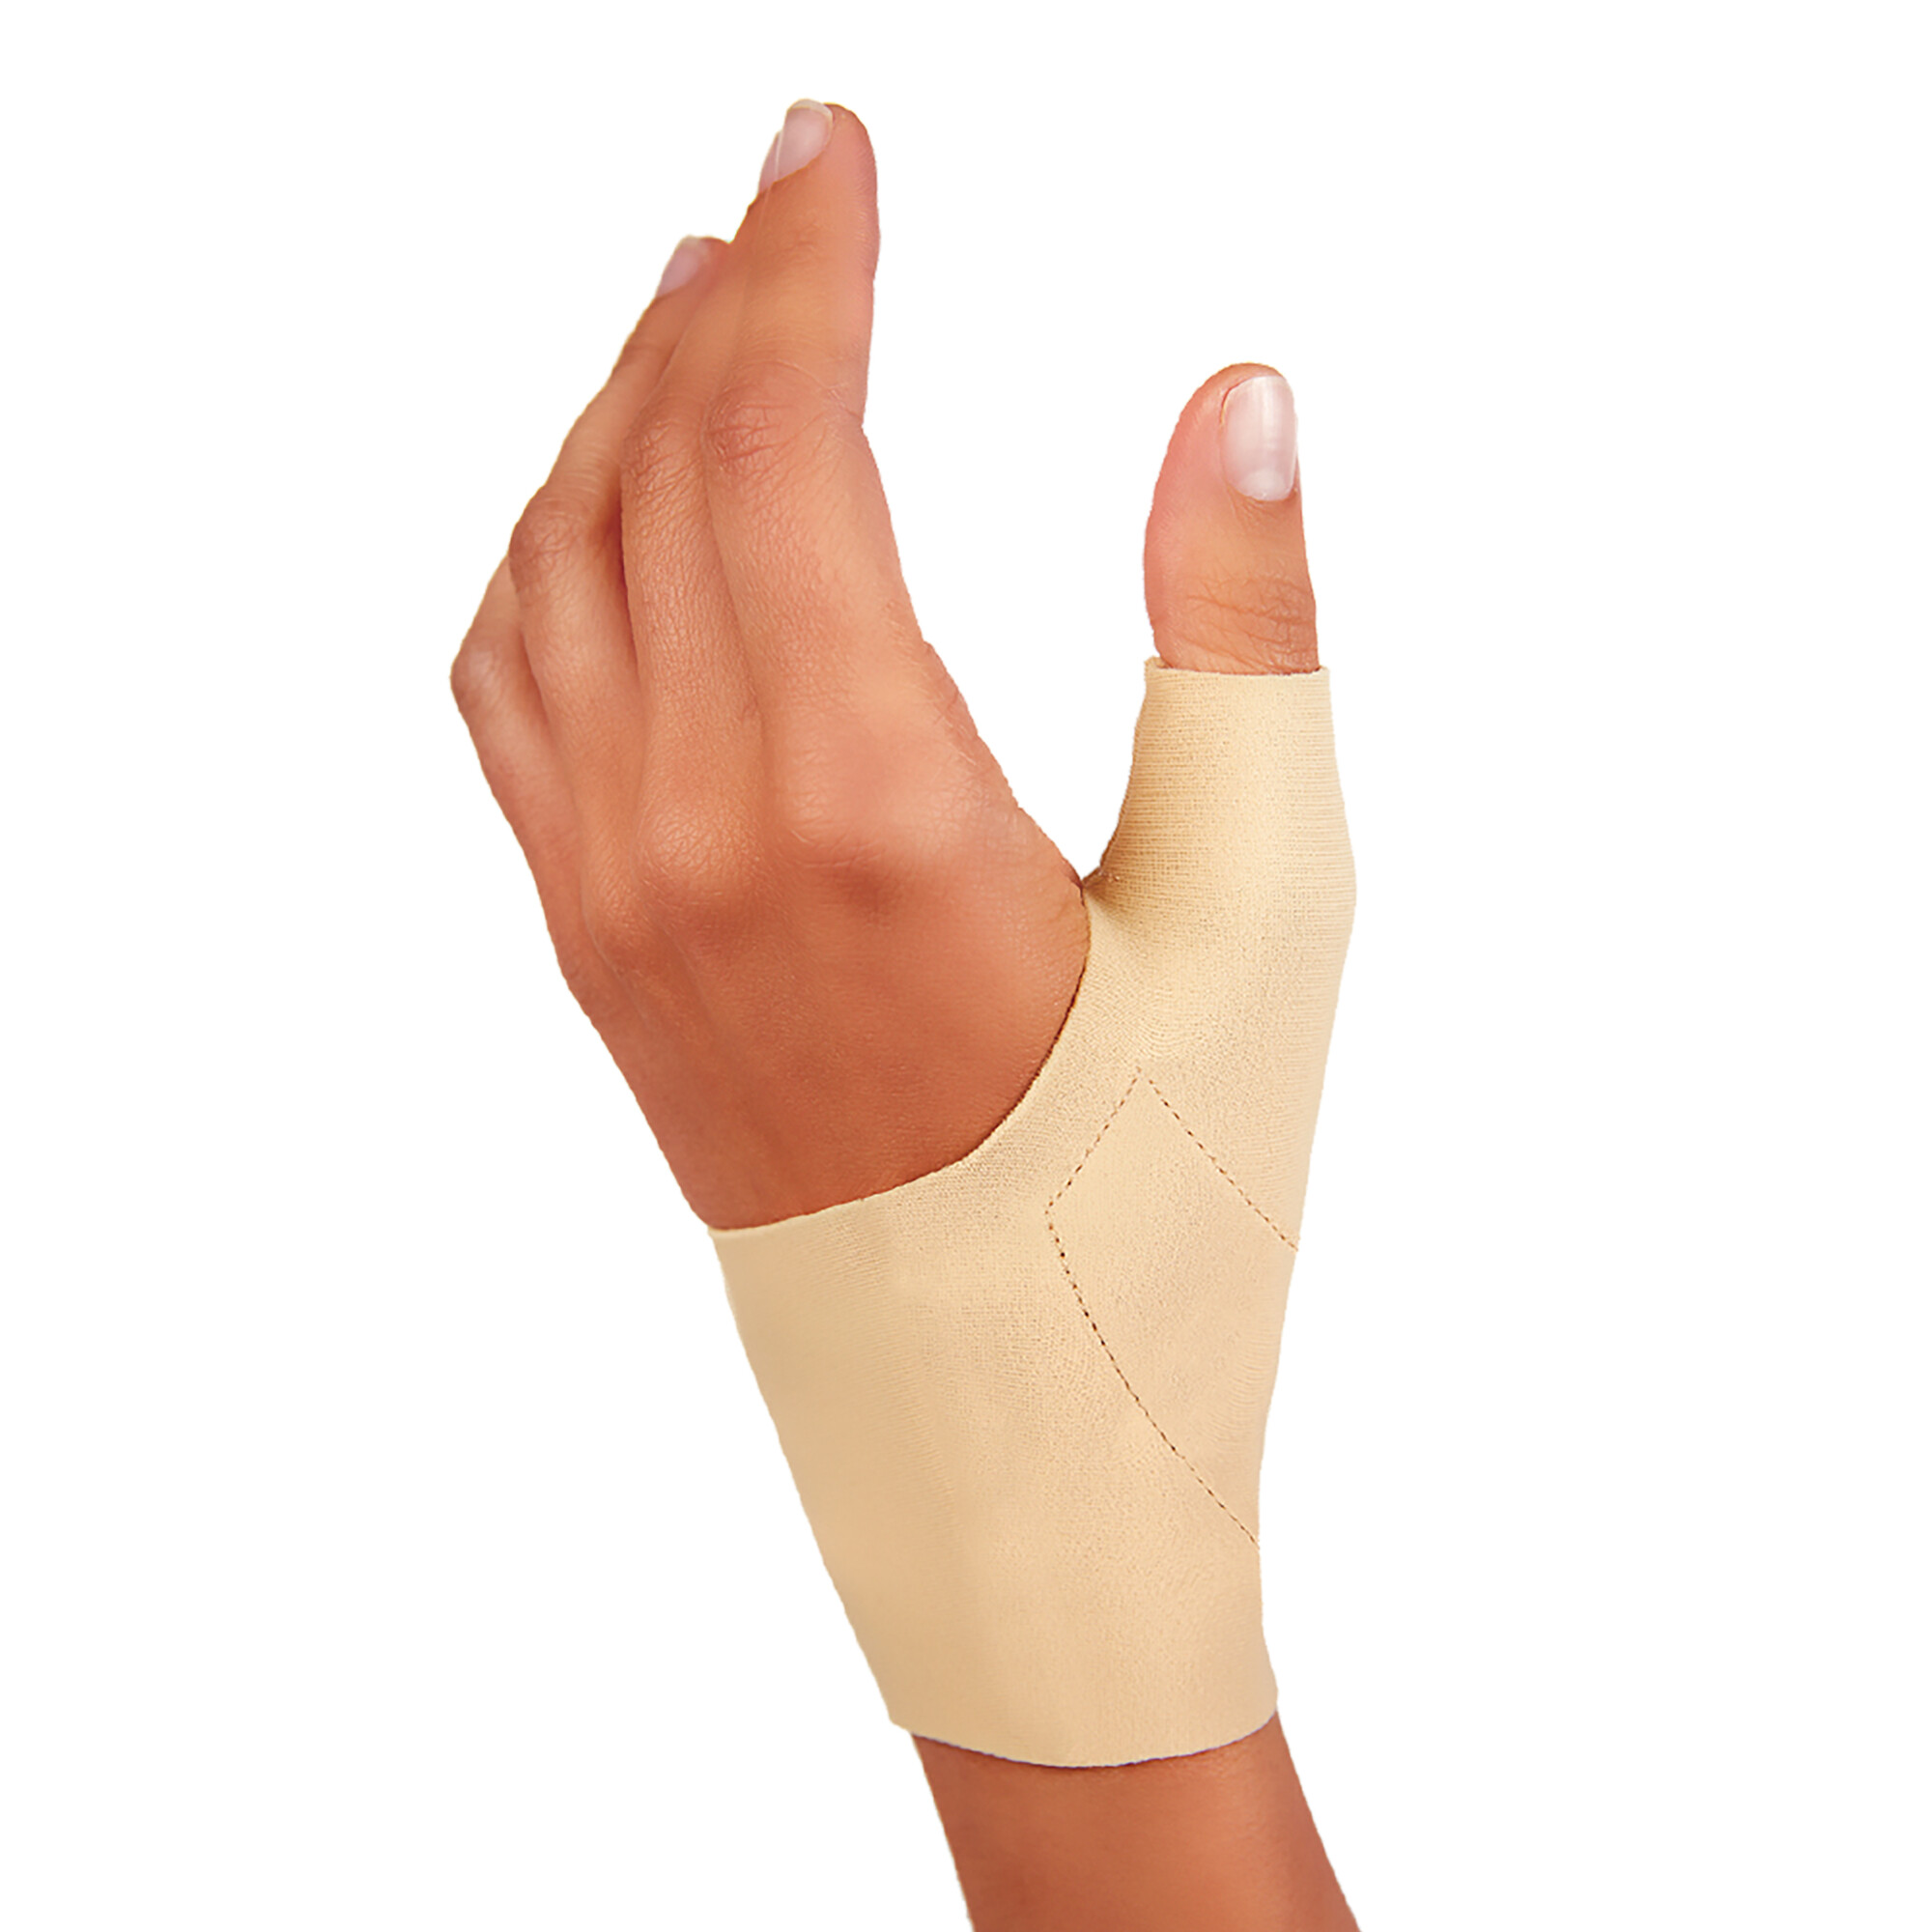 Flexible Daumen-Bandage, 1 Stück